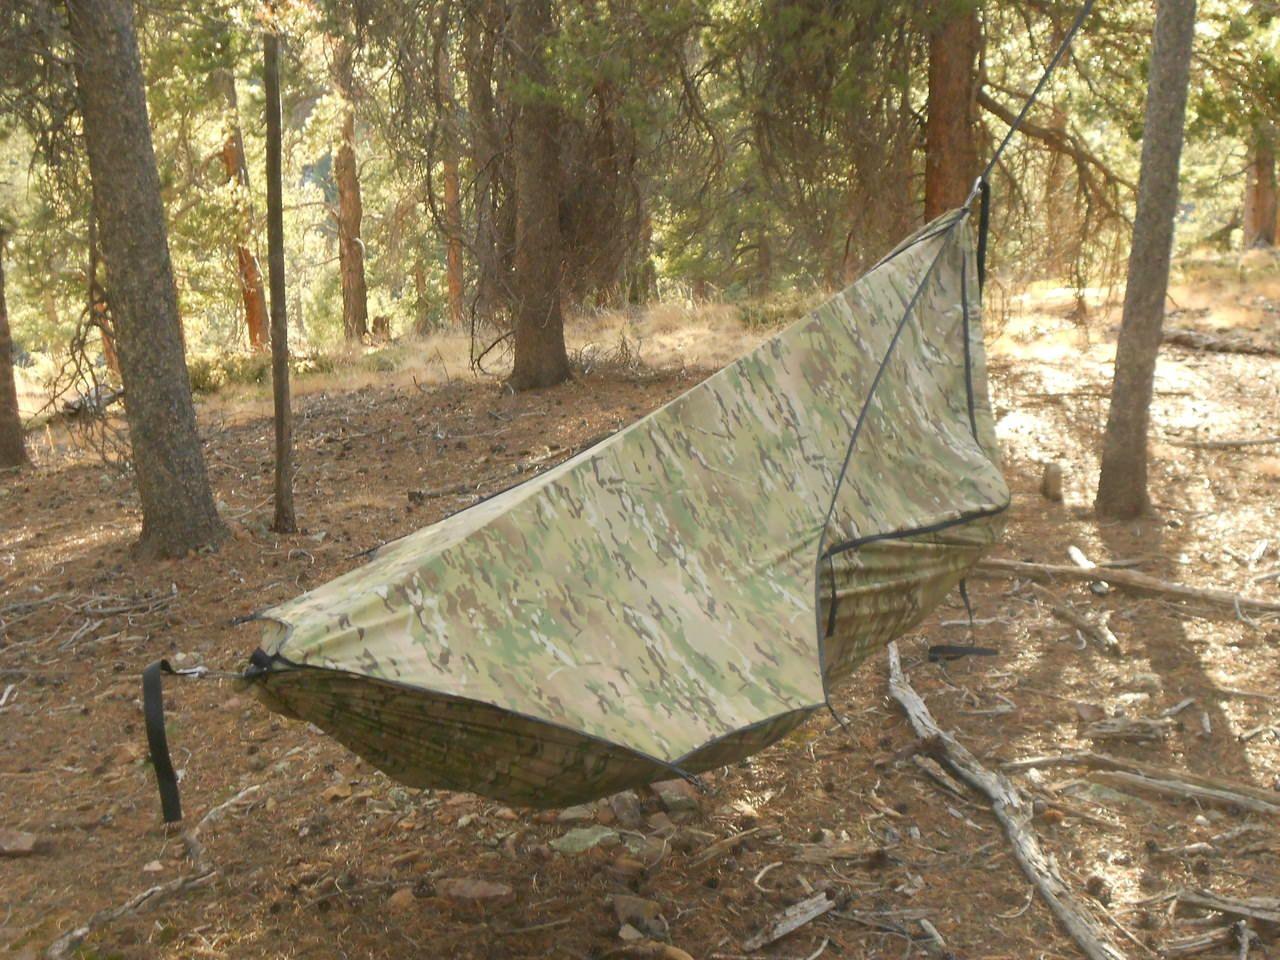 american swings and made diego san orqu chair hammock chairs things basic dea volcano hammocks hanging